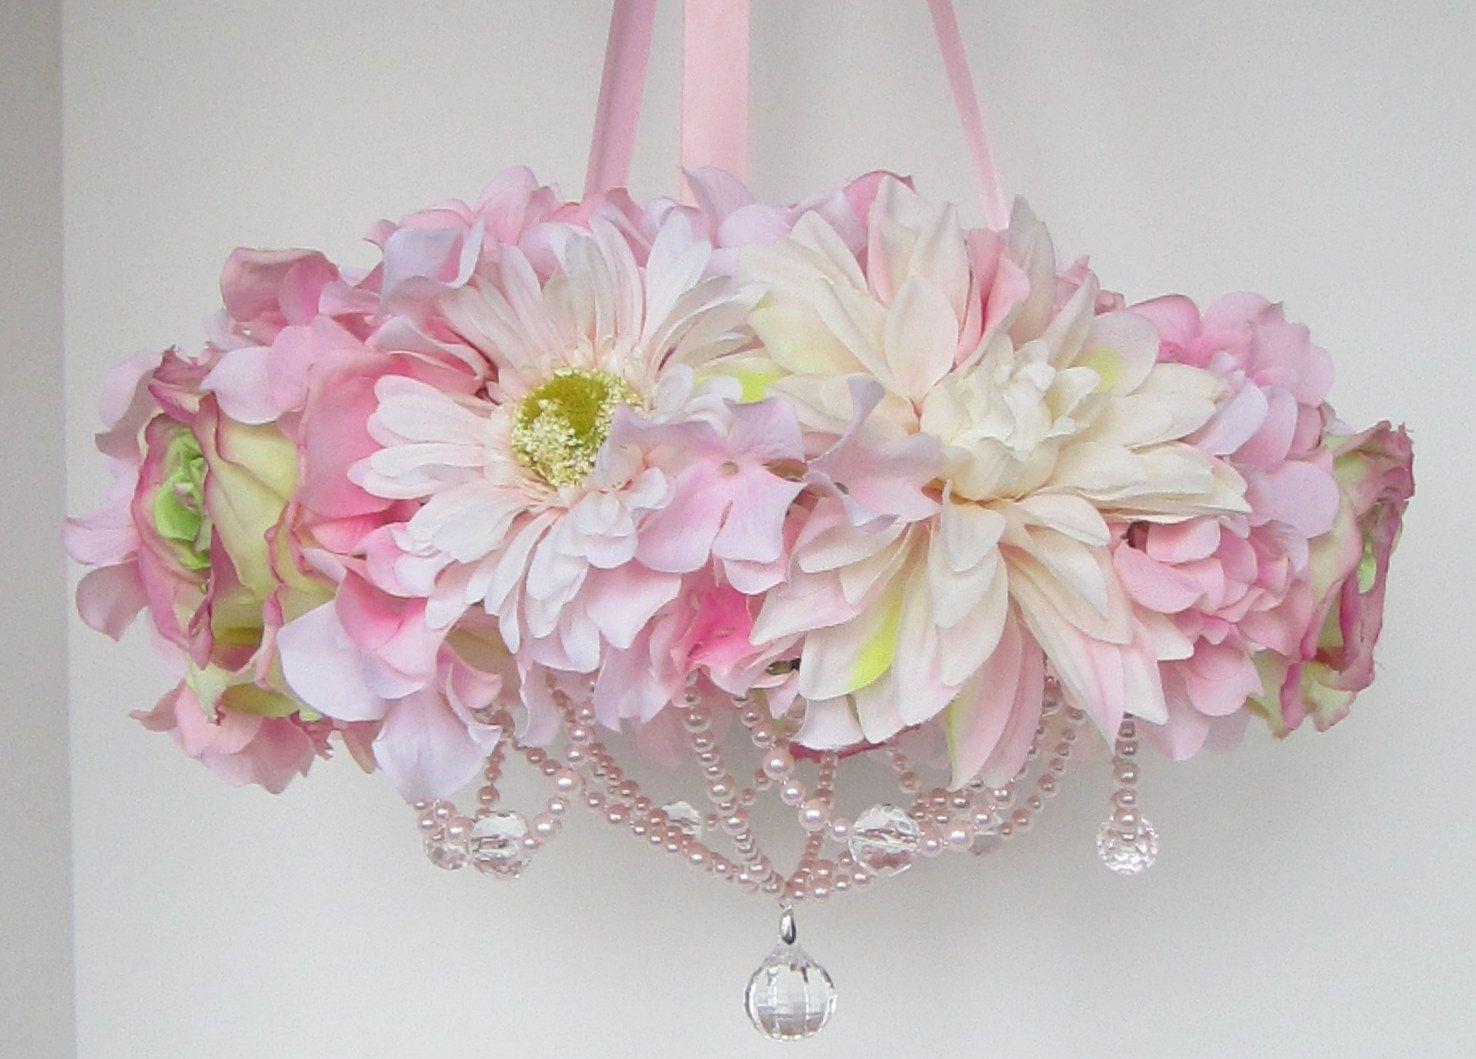 Baby mobile floral chandelier idea for a diy baby girl baby mobile floral chandelier idea for a diy aloadofball Choice Image